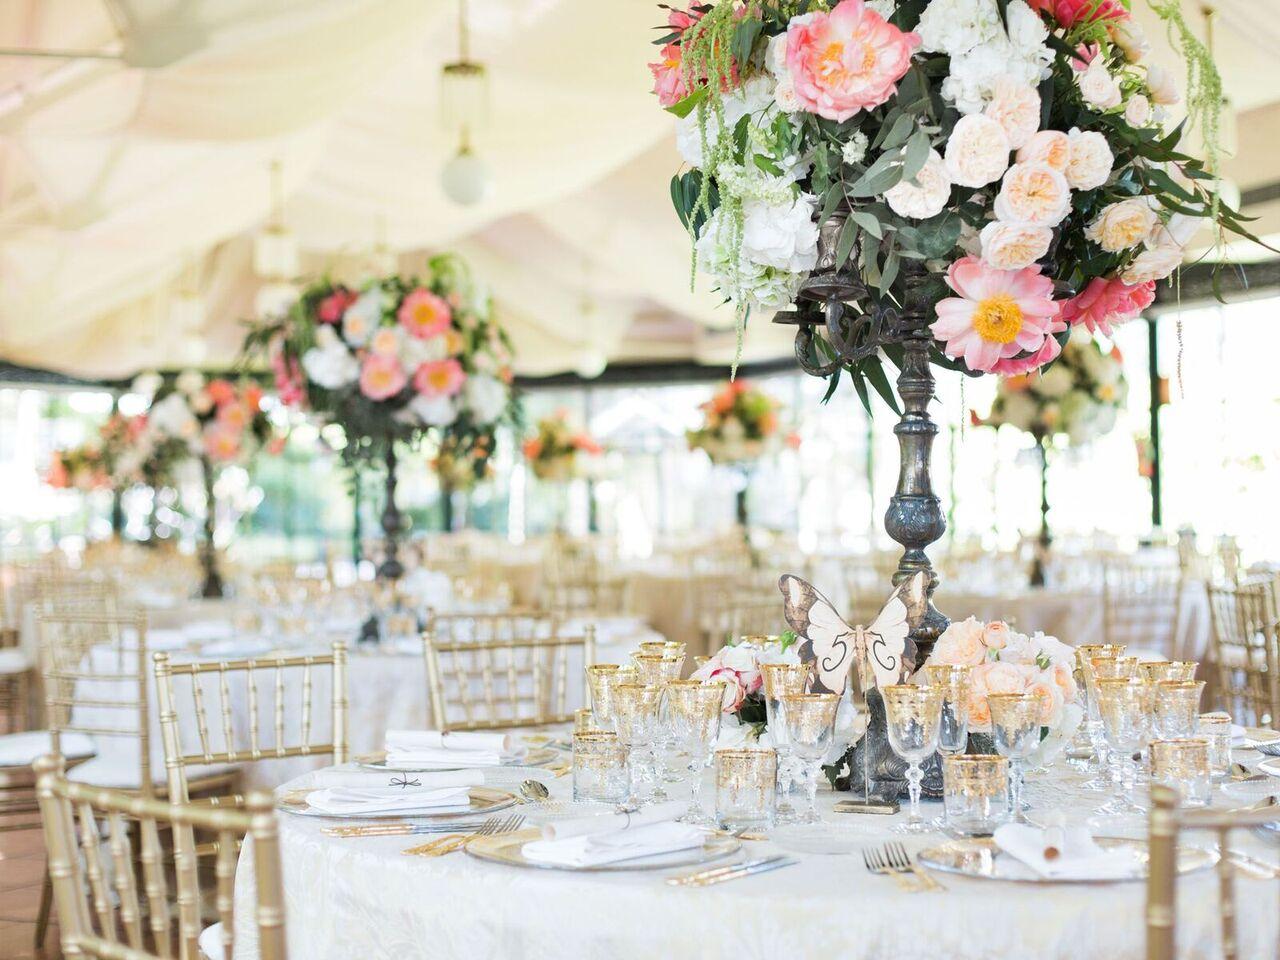 Si-Quiero-Wedding-Planner-By-Sira-Antequera-Paola-Pedro-18